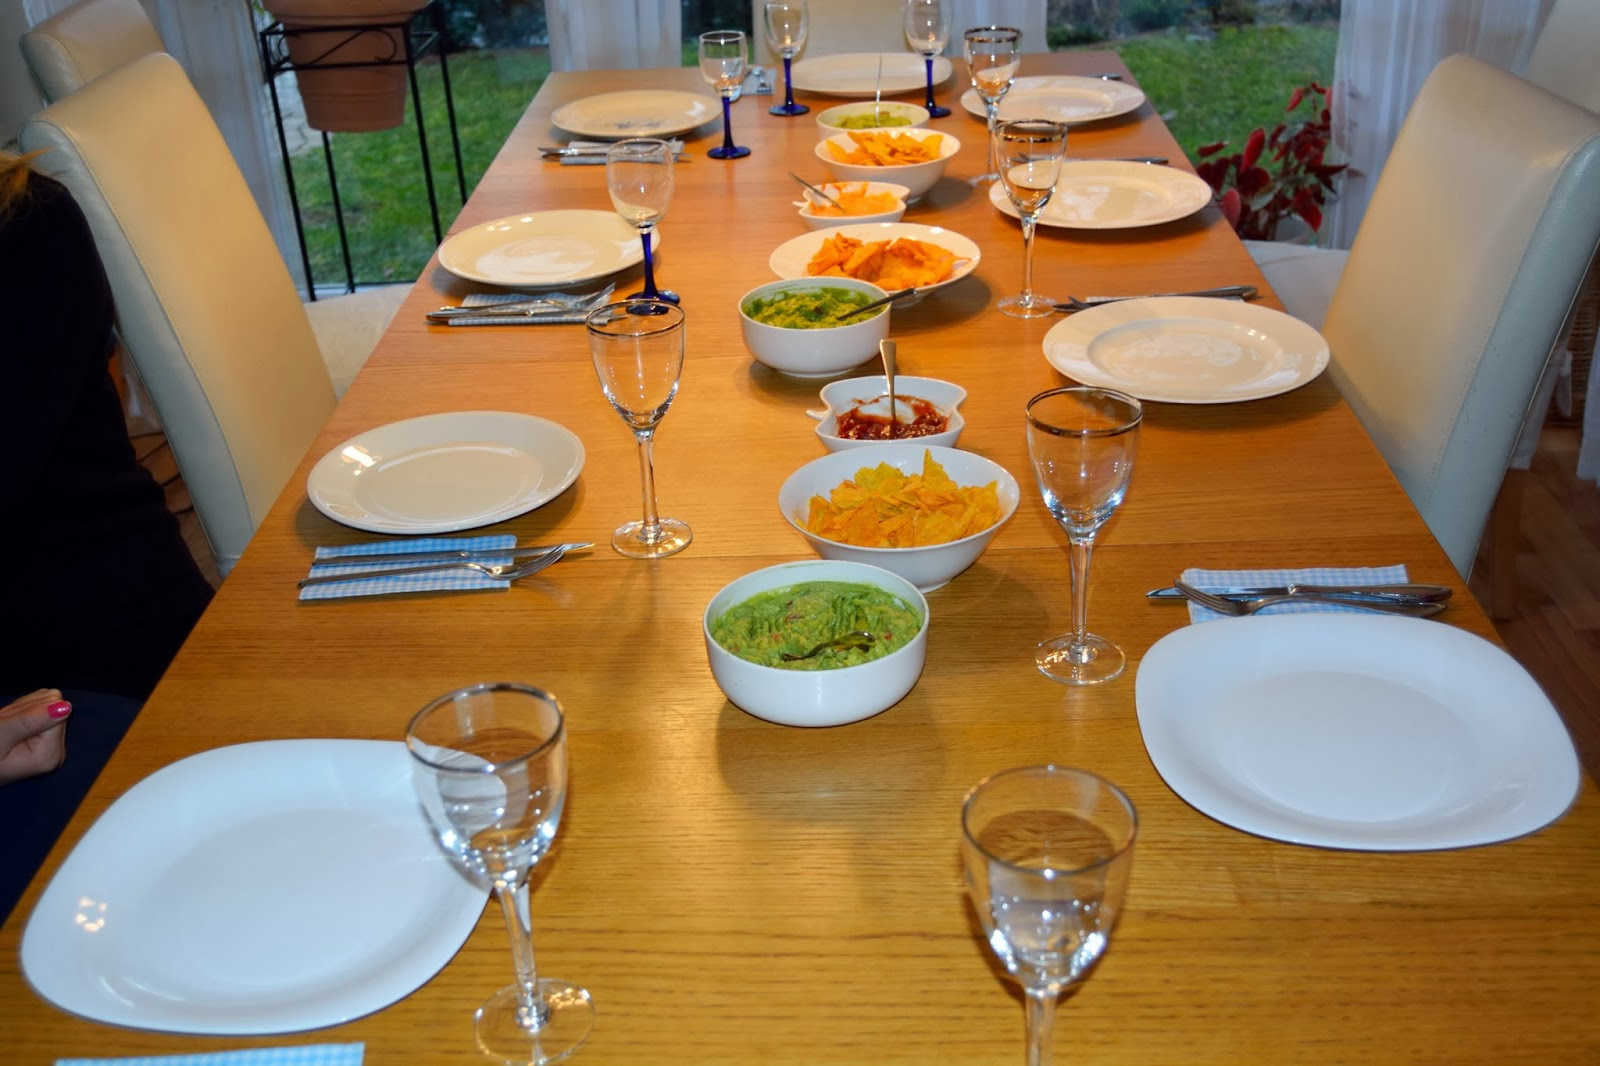 stiny style kochen mit freunden mexikanisch mole con pollo und guacamole. Black Bedroom Furniture Sets. Home Design Ideas